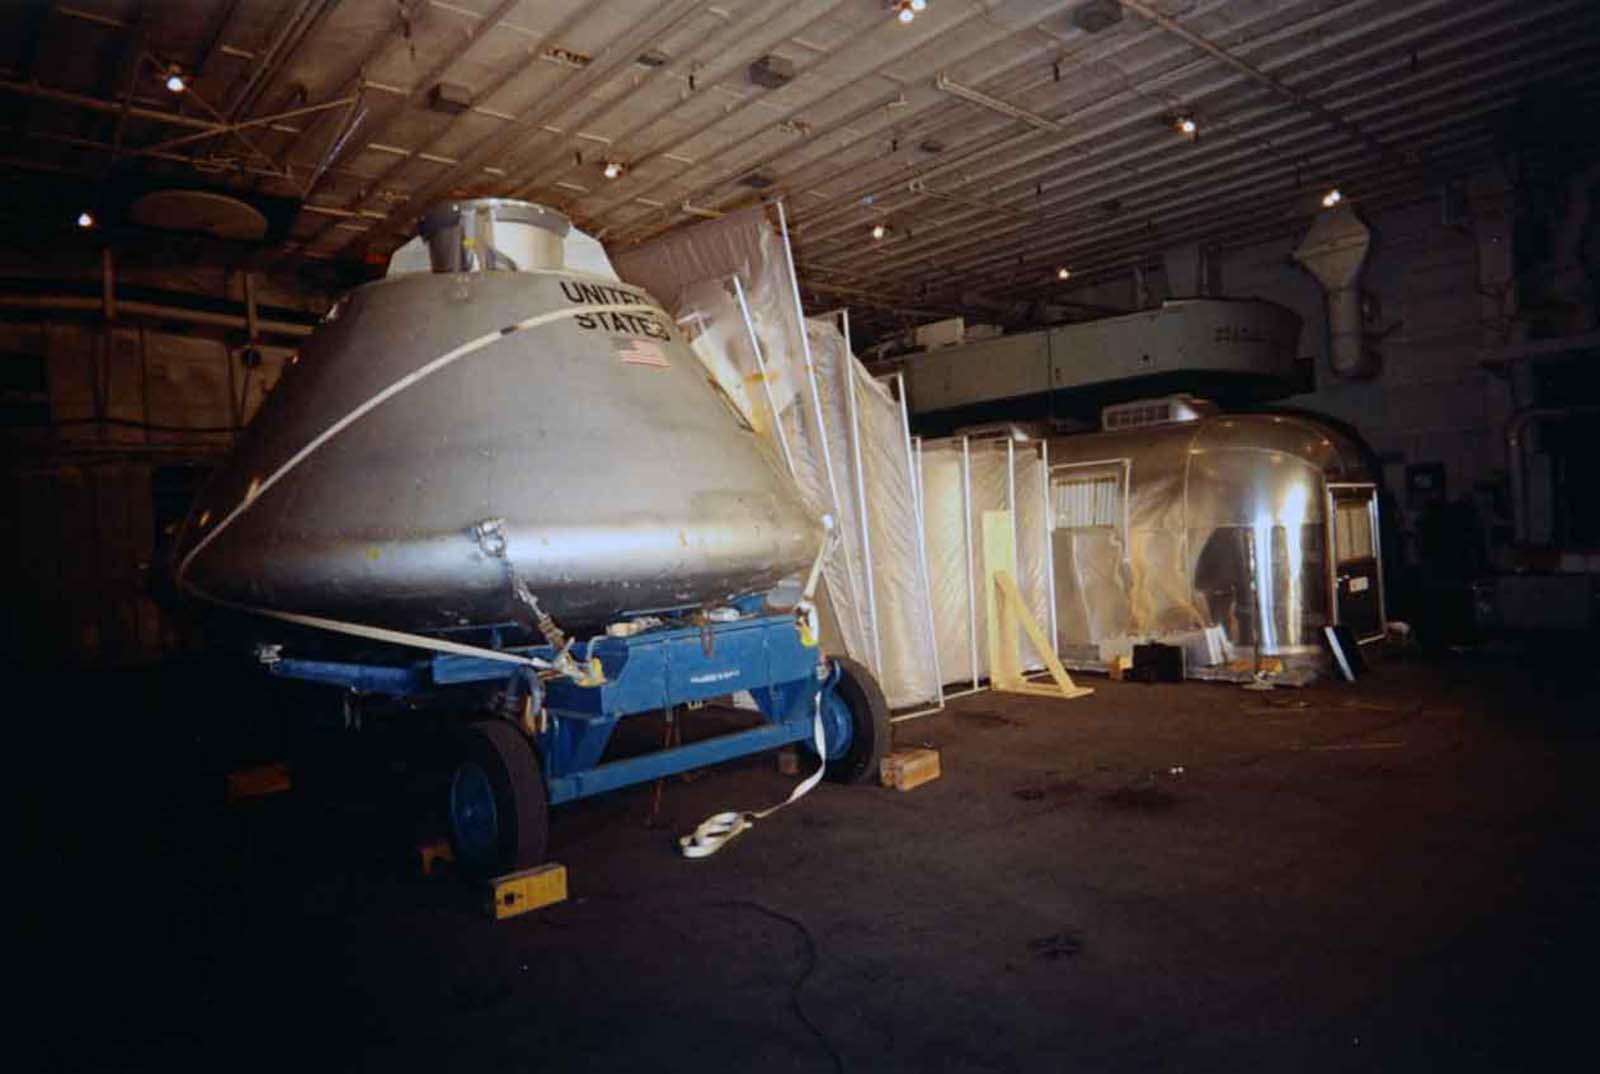 Inside the mobile quarantine facility for Apollo 11.